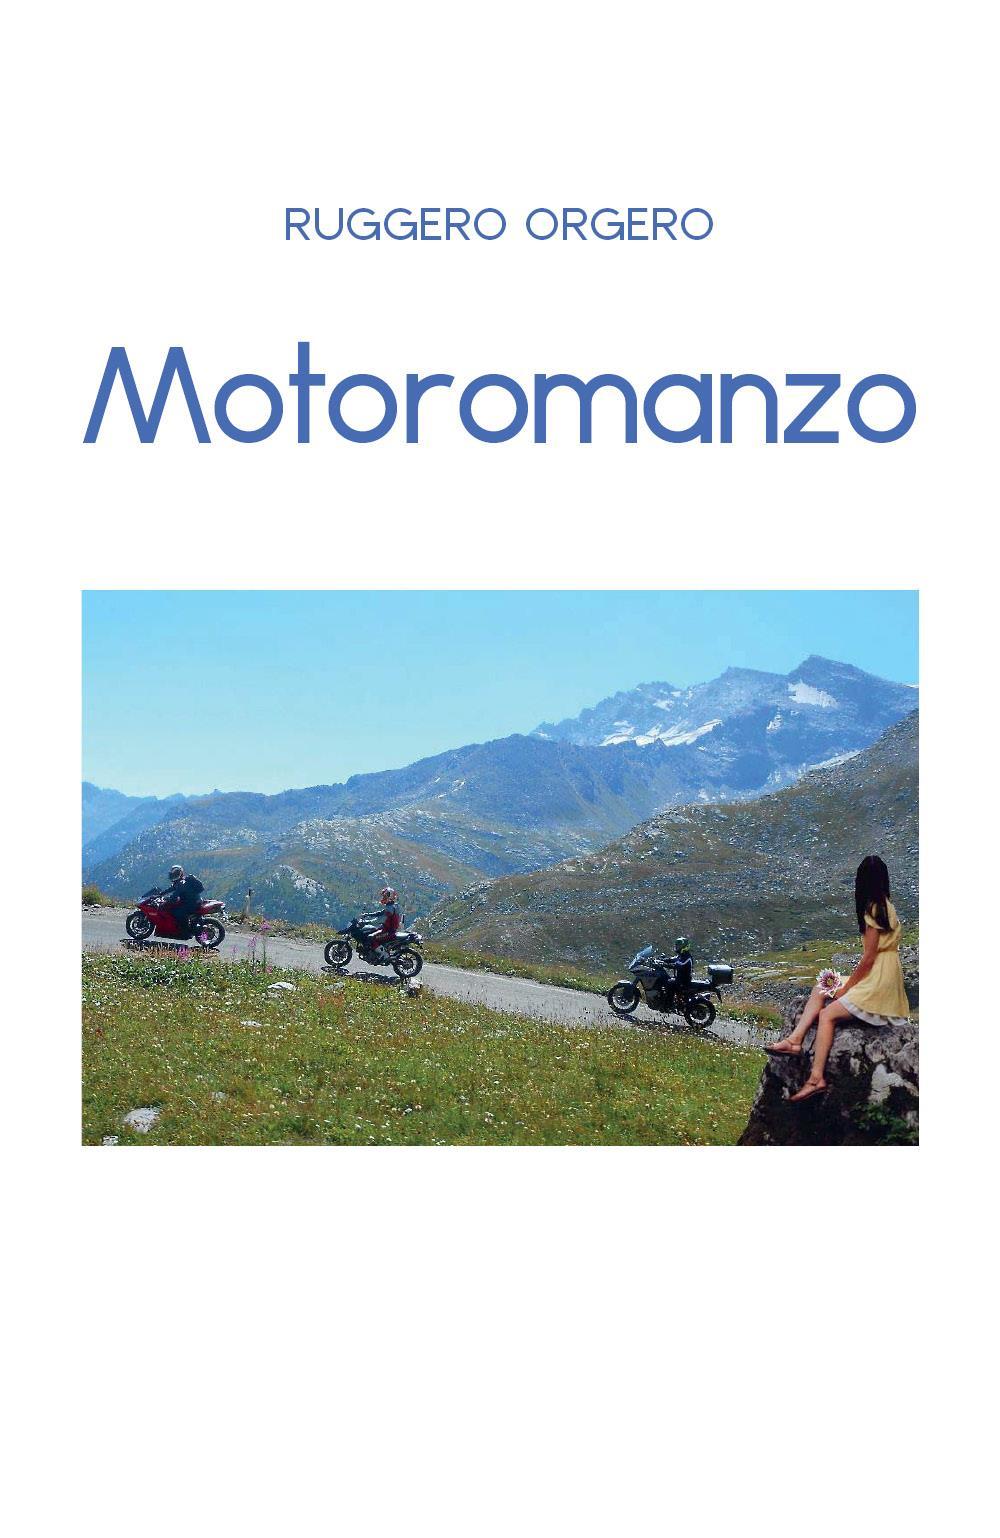 Motoromanzo